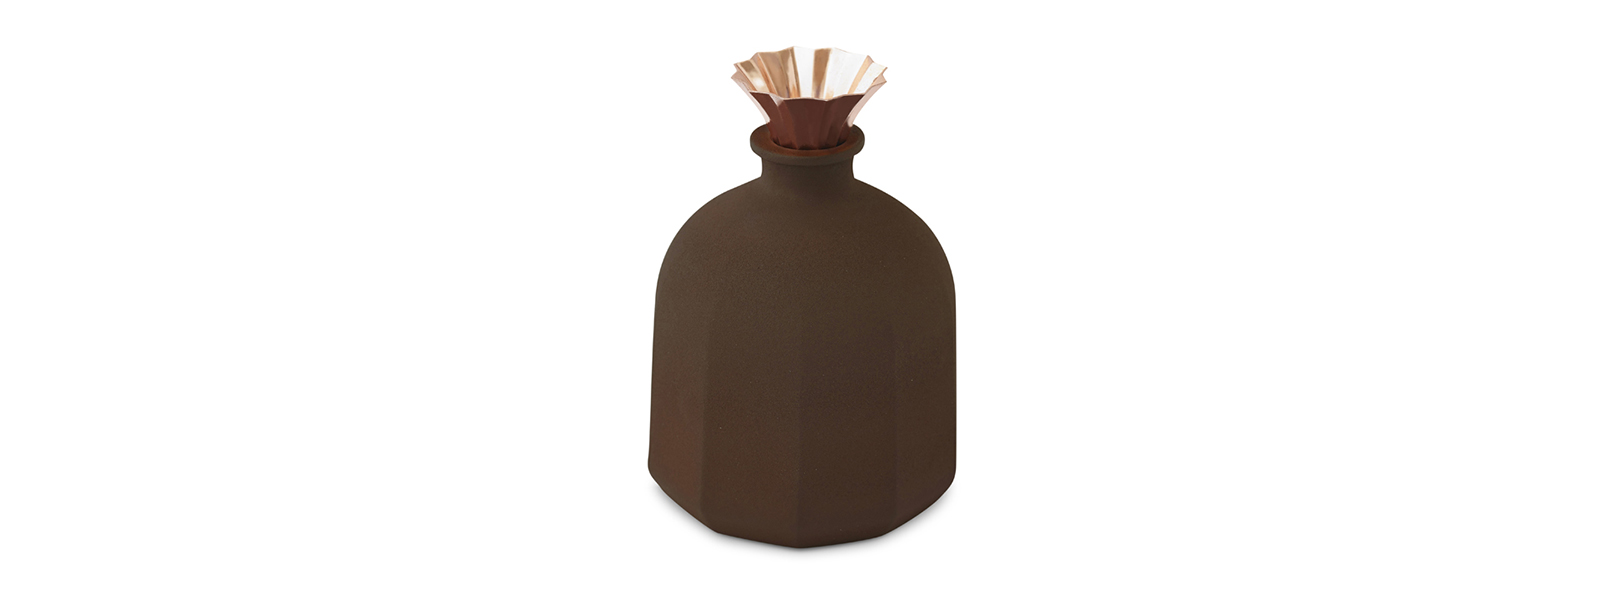 http://www.toastliving.com/img/files/product/MEMORY/MEMORY-Wine_LT06011_BIG.jpg